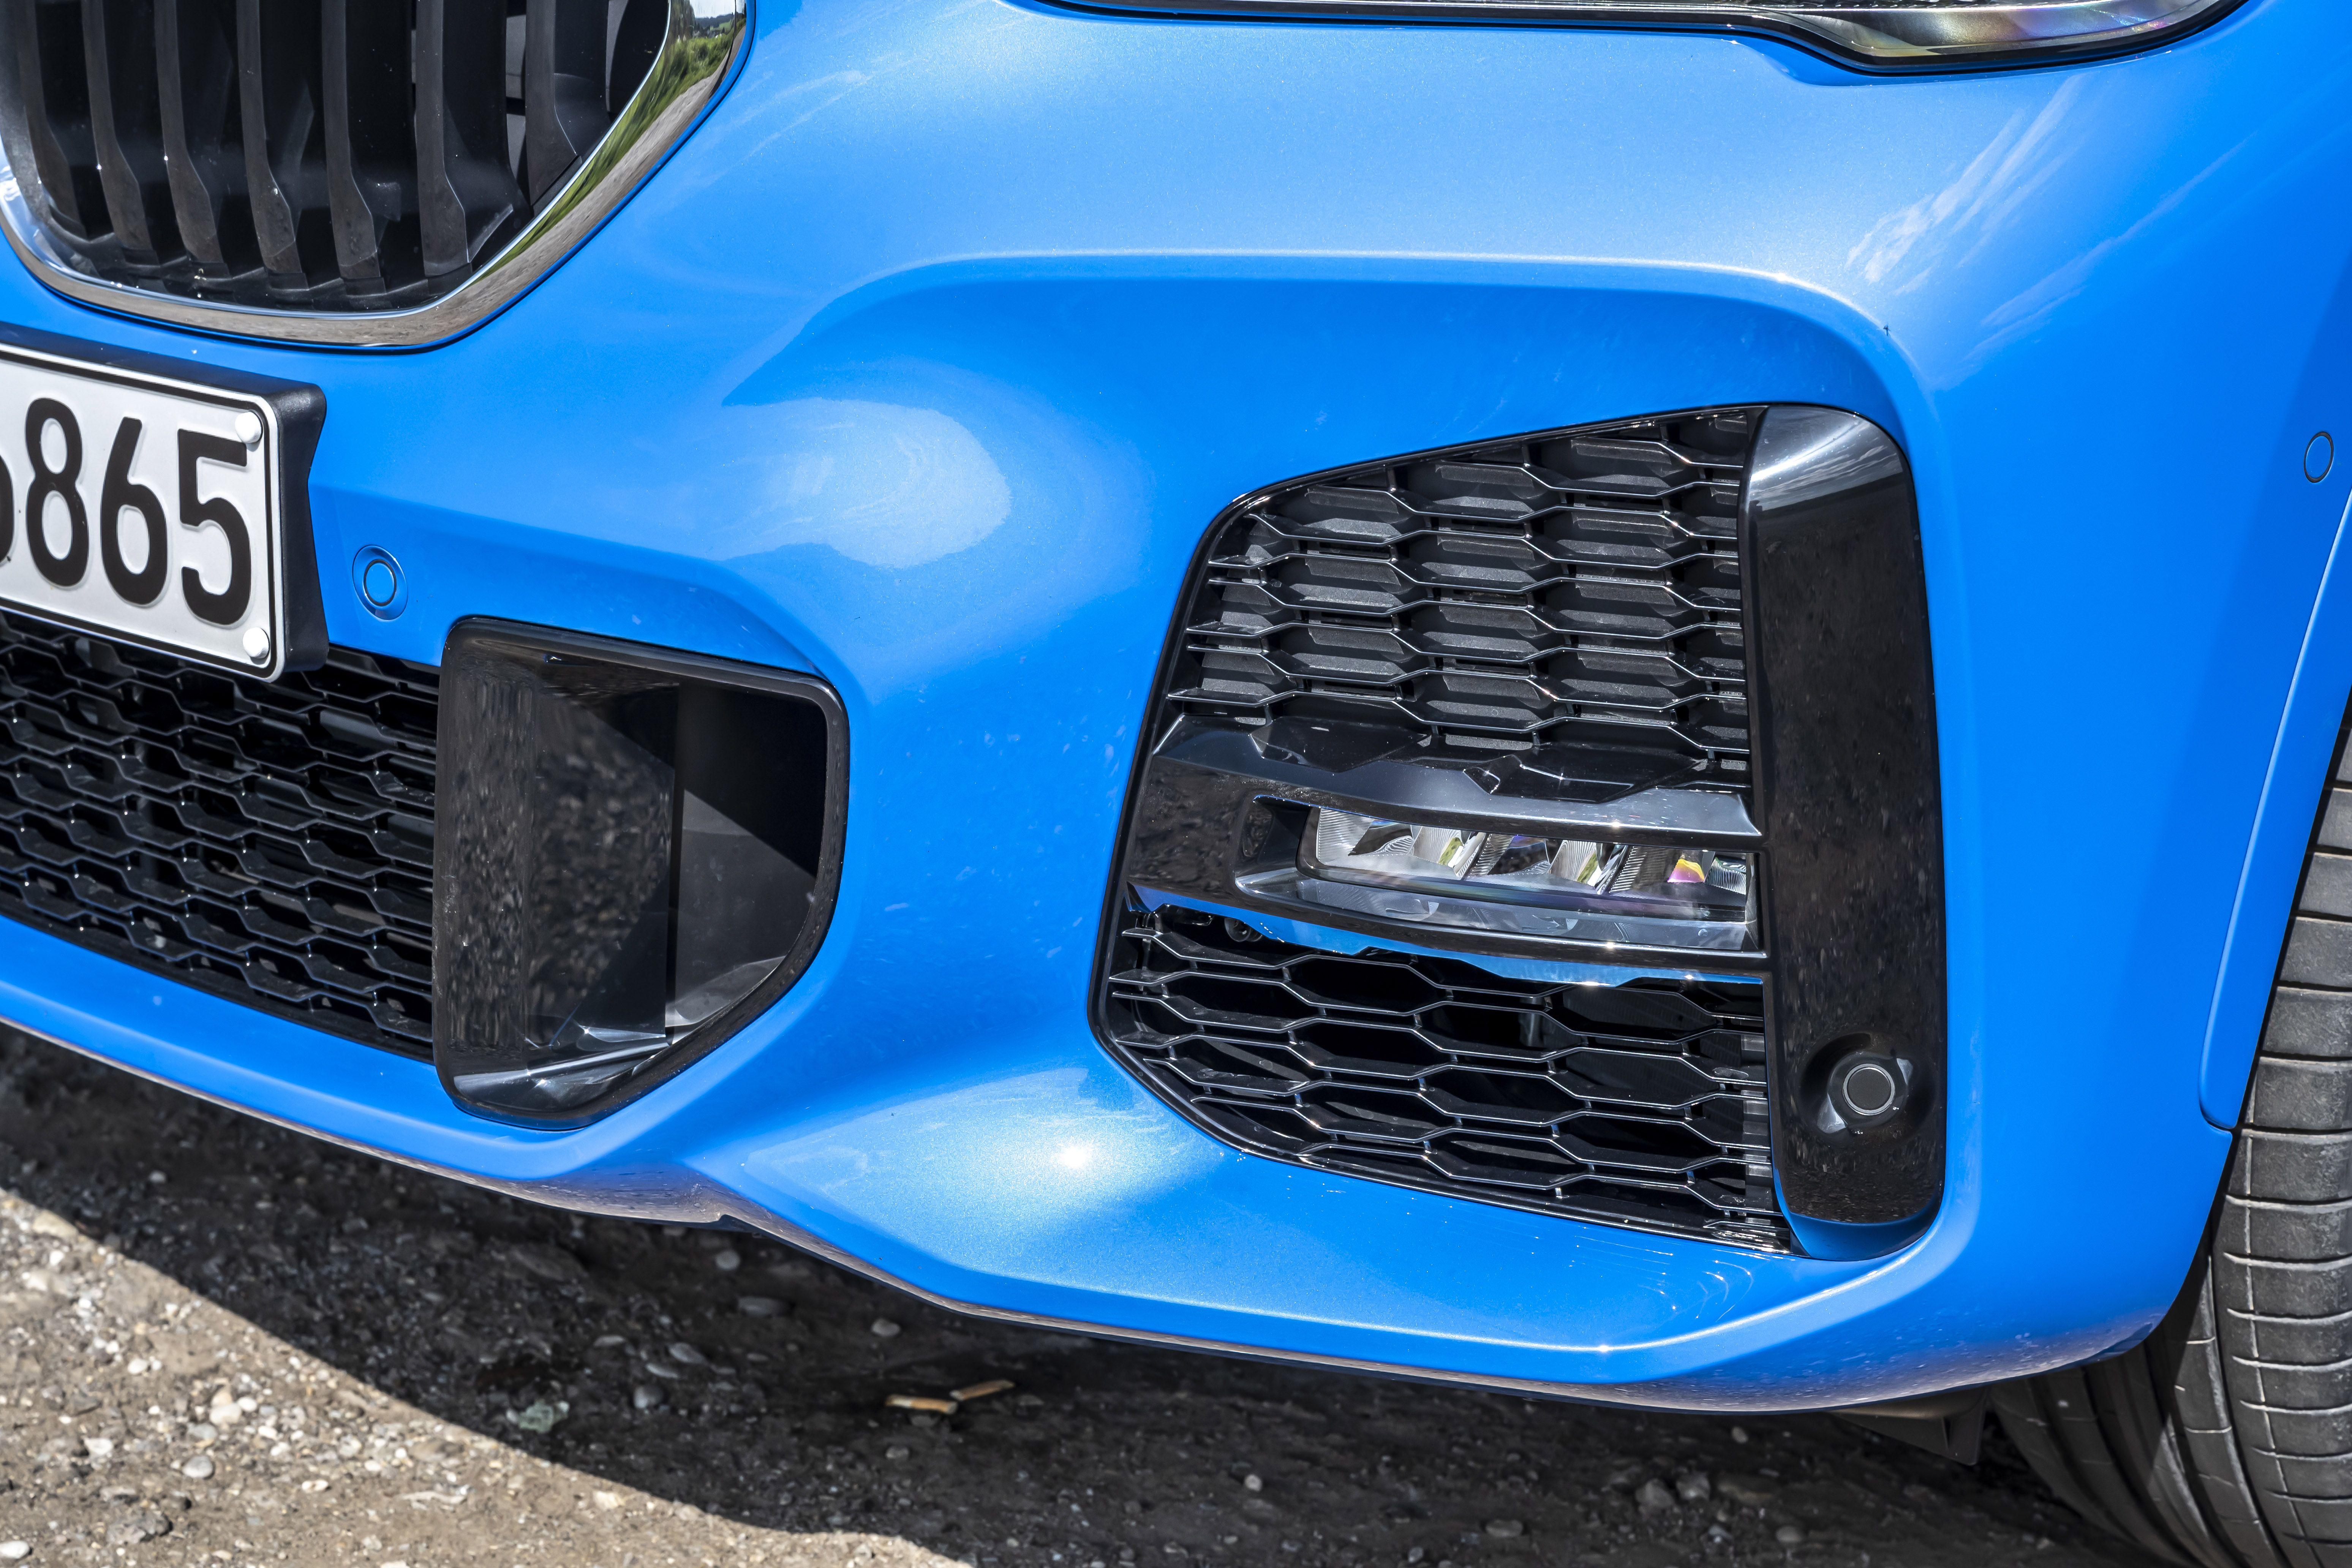 Pin by kasra esmaili on blue Bmw, Honda logo, Sports models